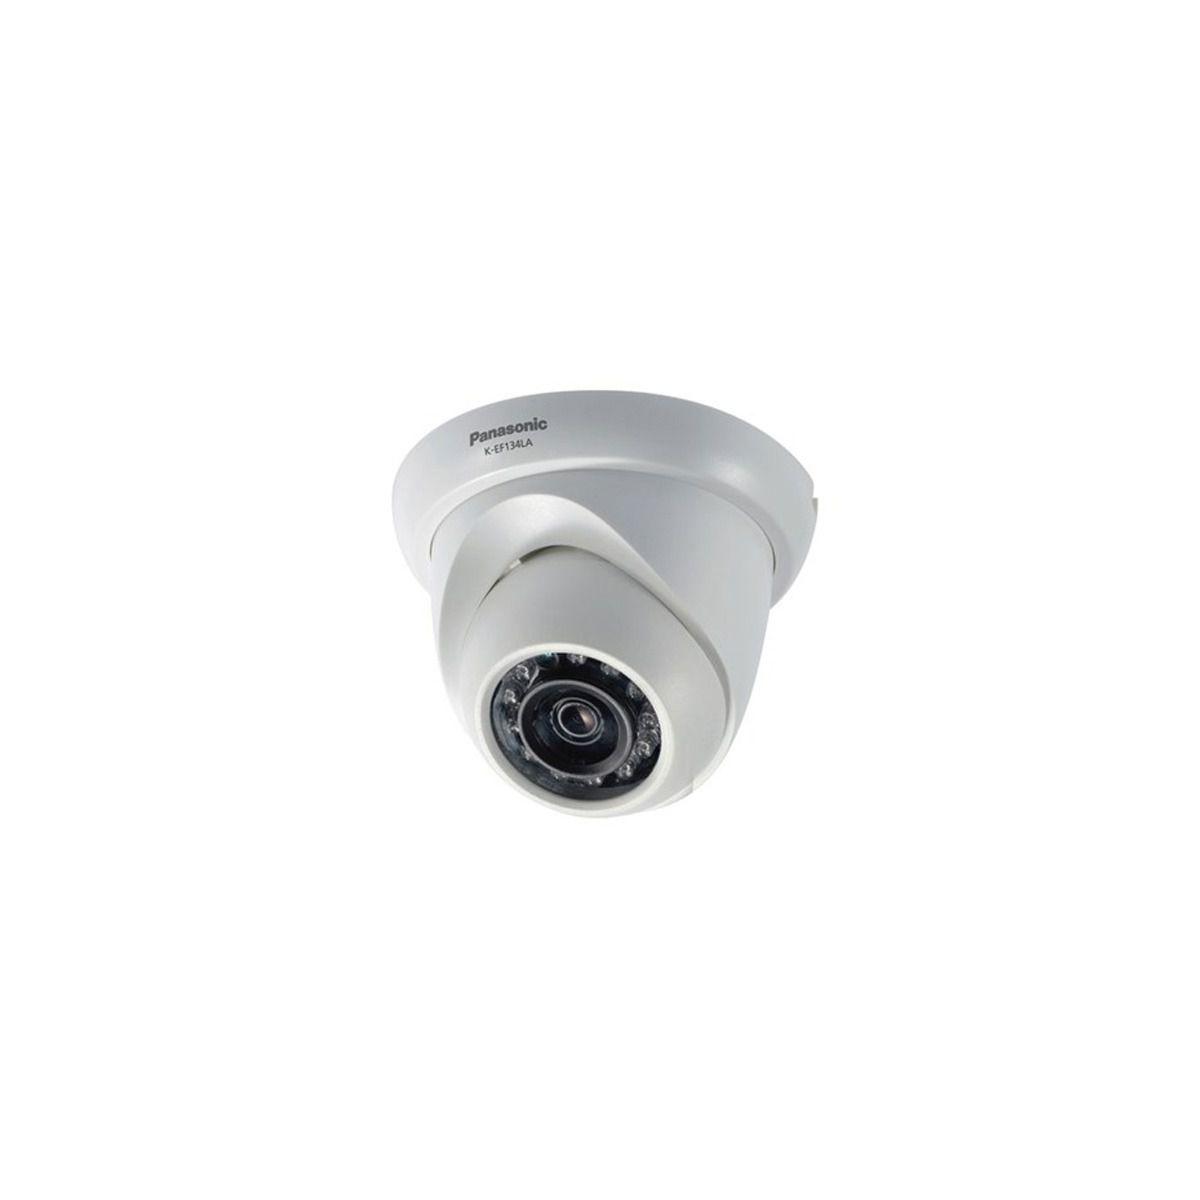 Camera IP Panasonic K-EF134L03AE Poe Lente 3,6mm